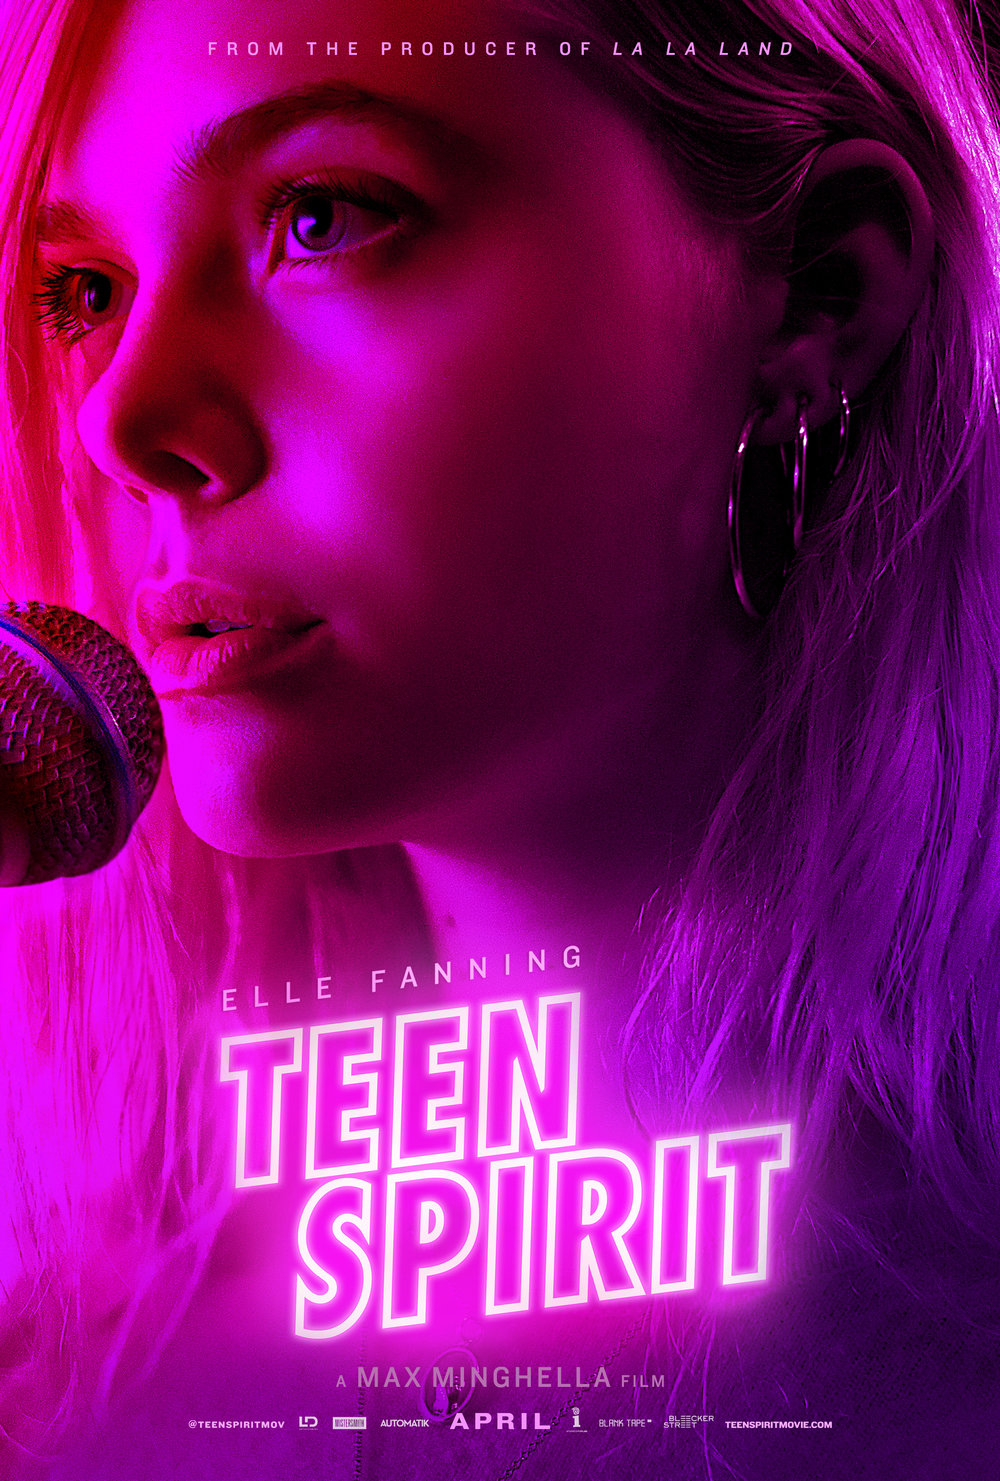 Teen Spirit, Elle Fanning, 2019